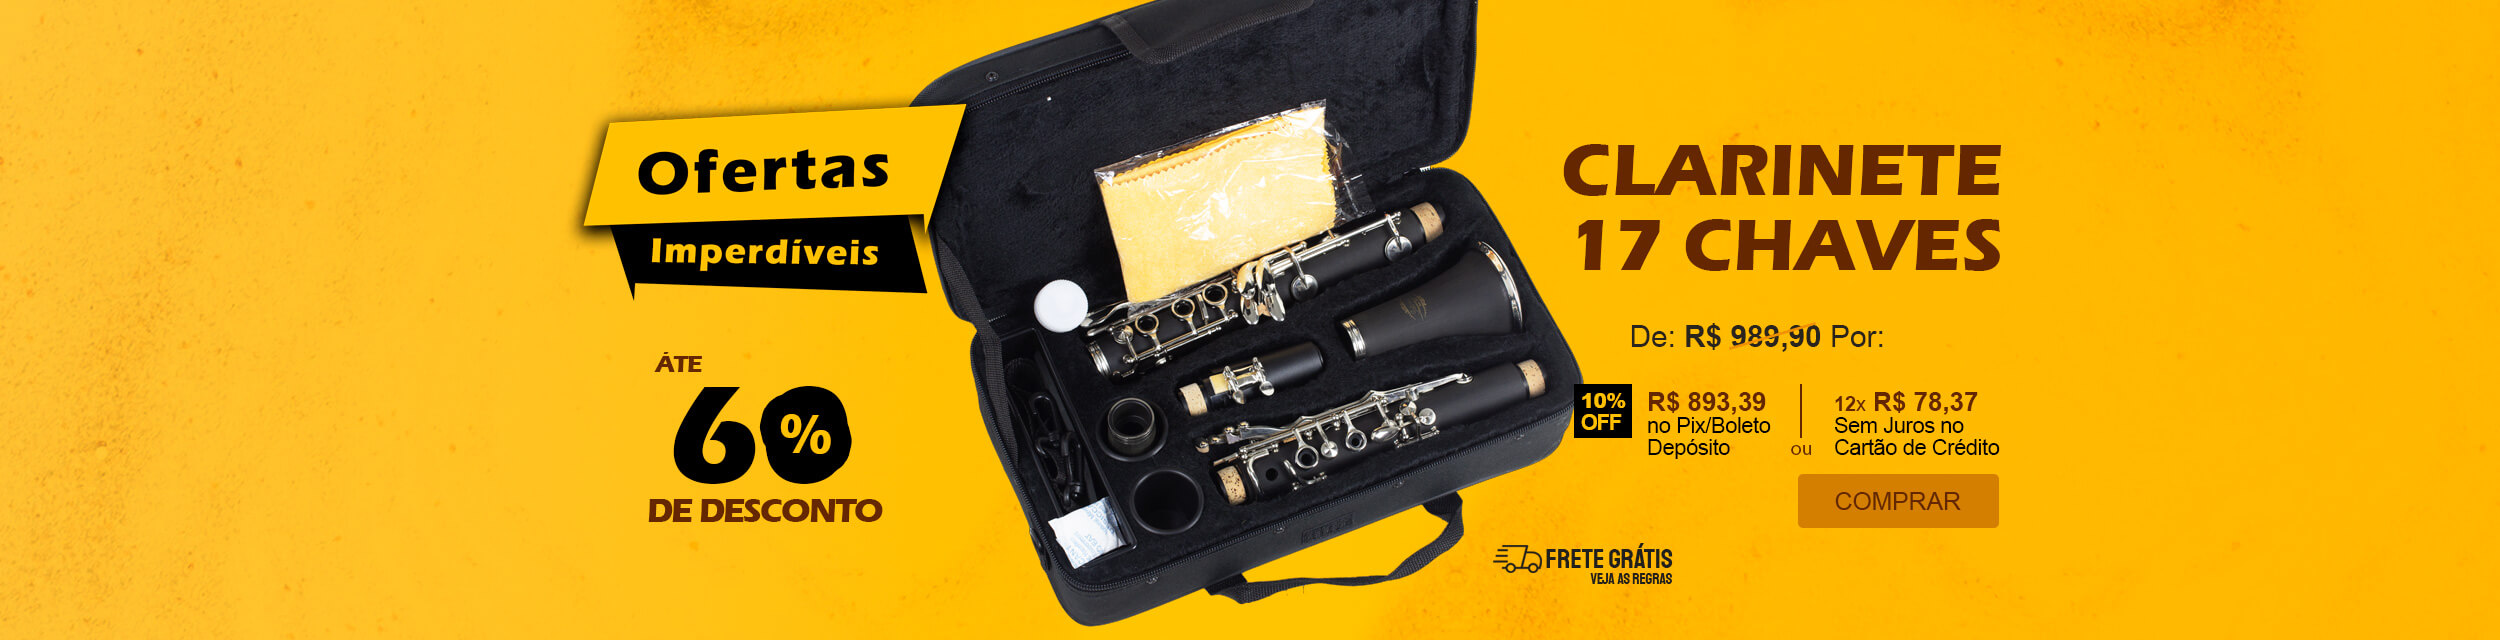 Ofertas Imperdíveis - Clarinete Sib 17 Chaves Jahnke